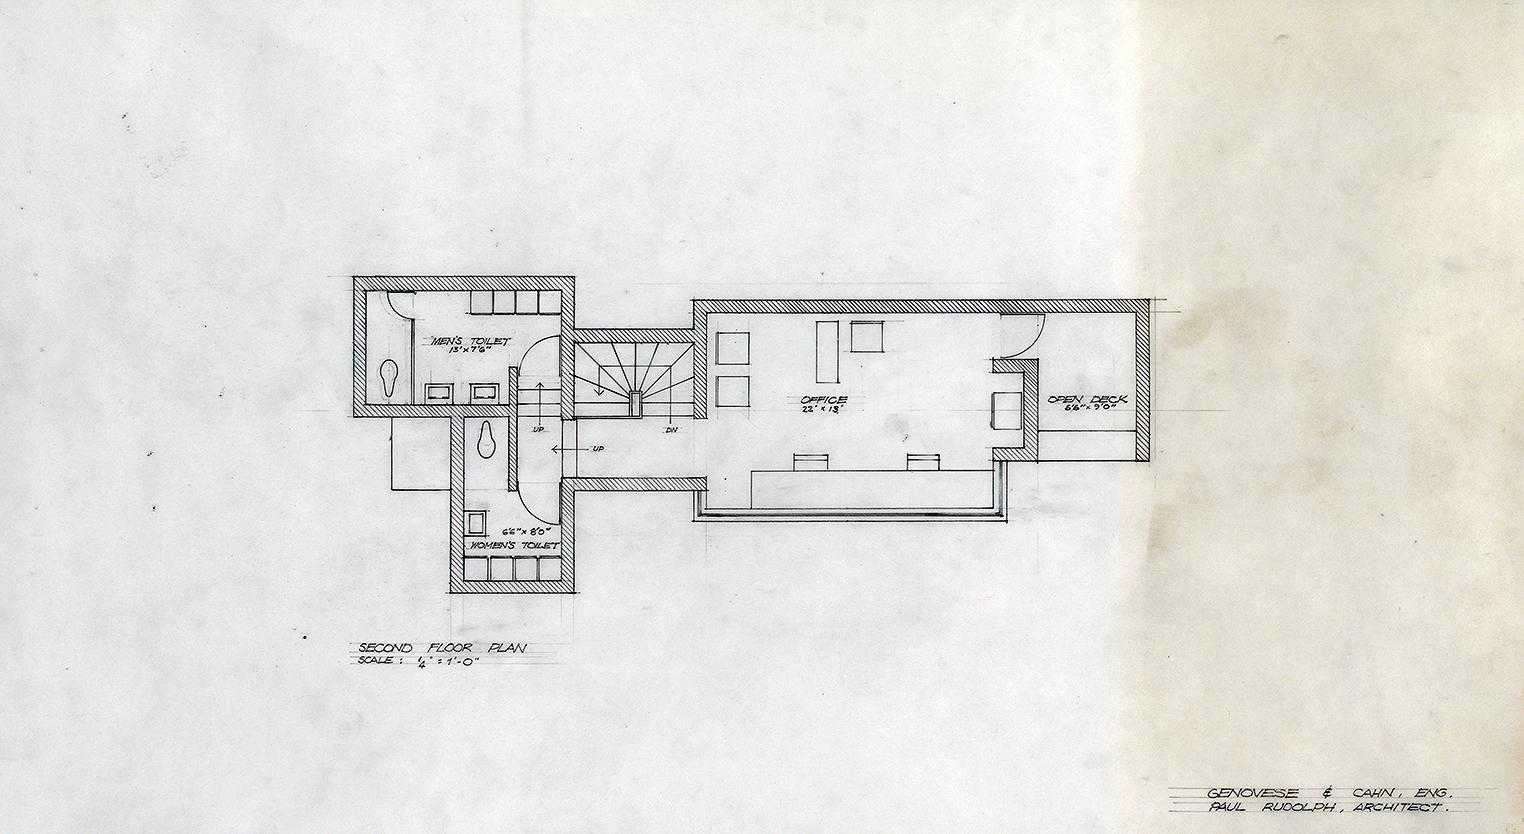 Manager's Office, Parking Garage,  New Haven, Connecticut. Scheme C. Second Floor Plan.